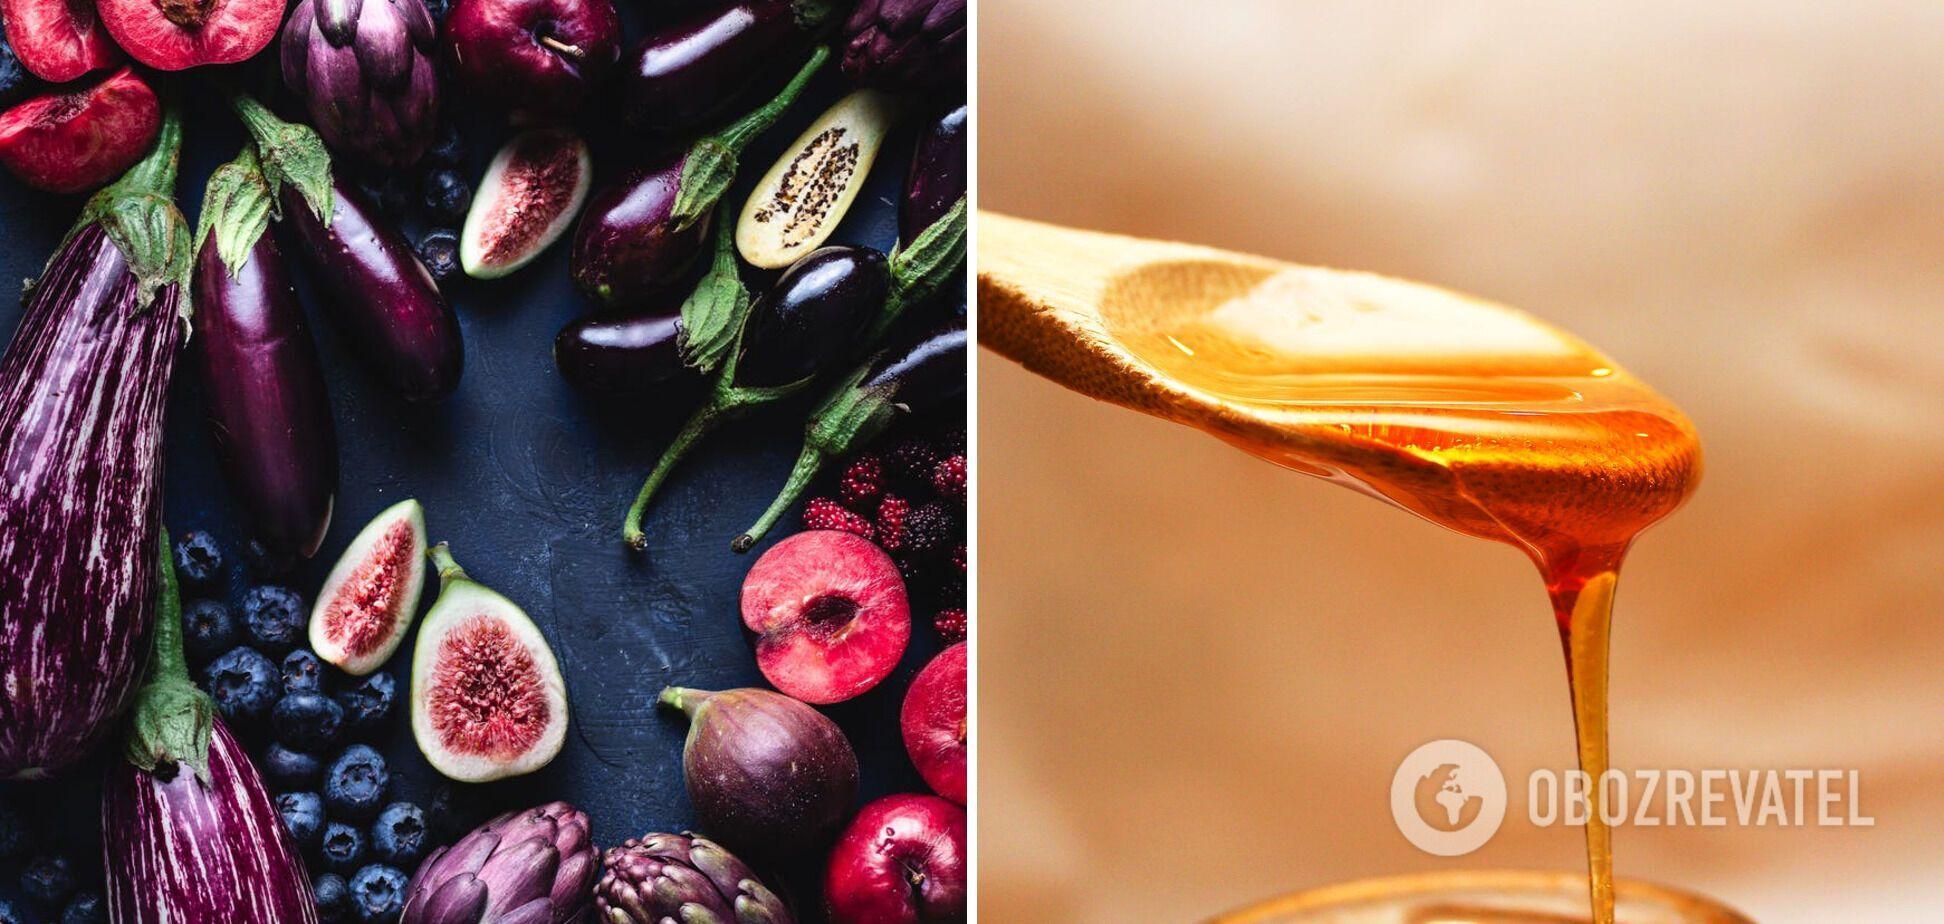 Фрукти, овочі та мед – кошерна їжа